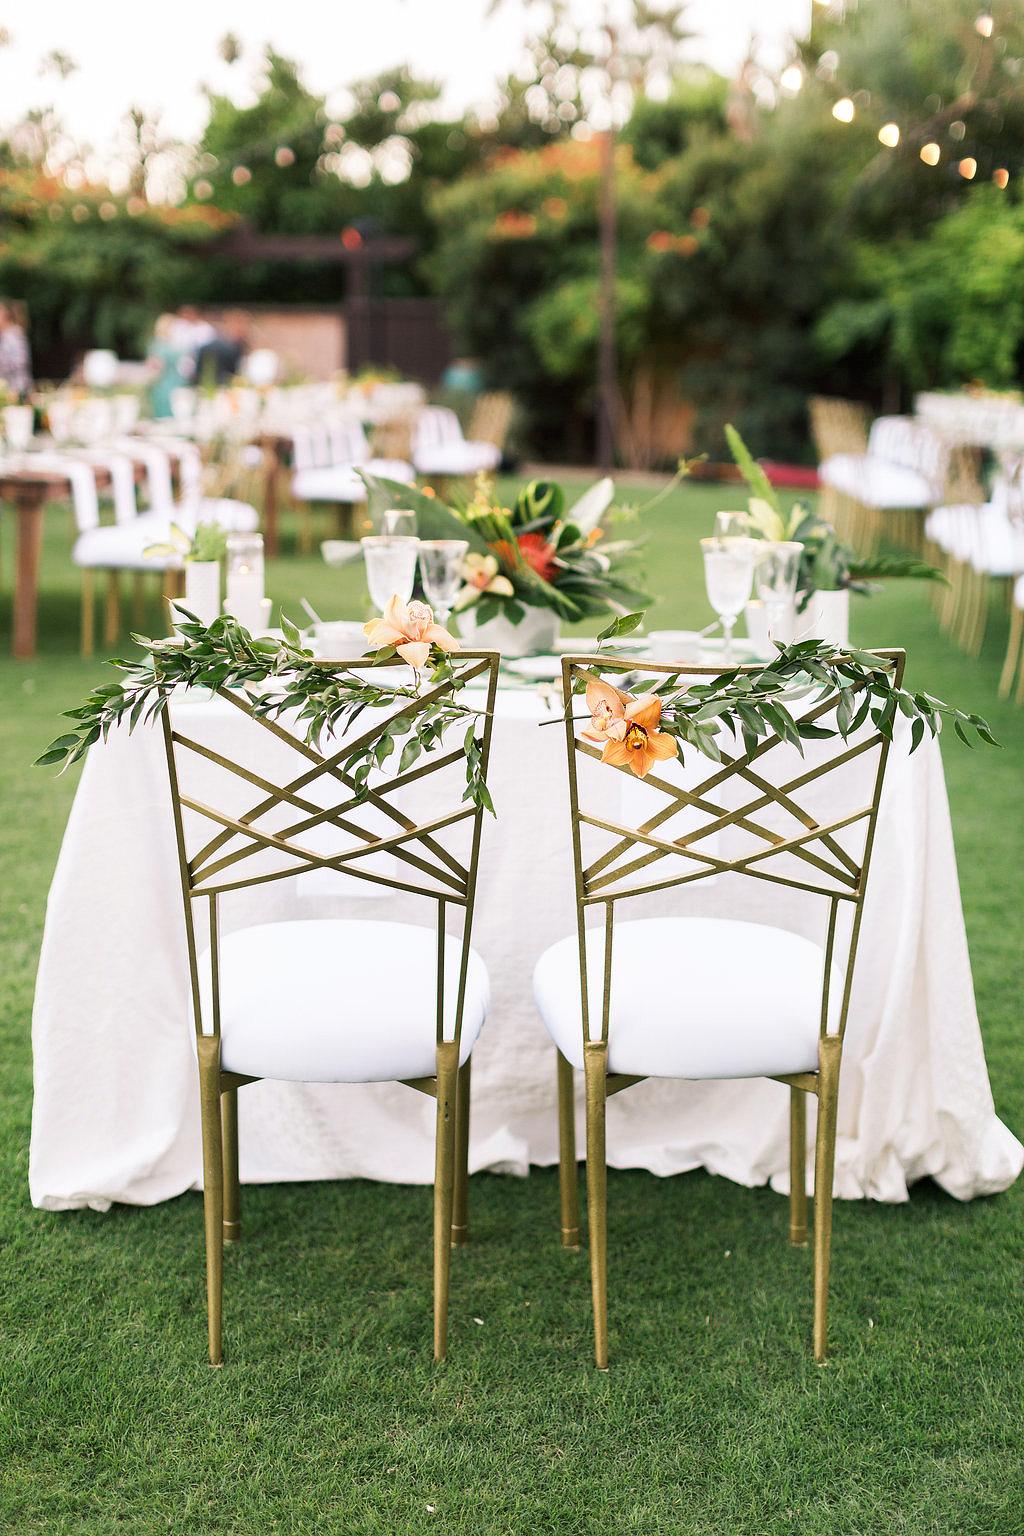 emily adhir wedding chairbacks